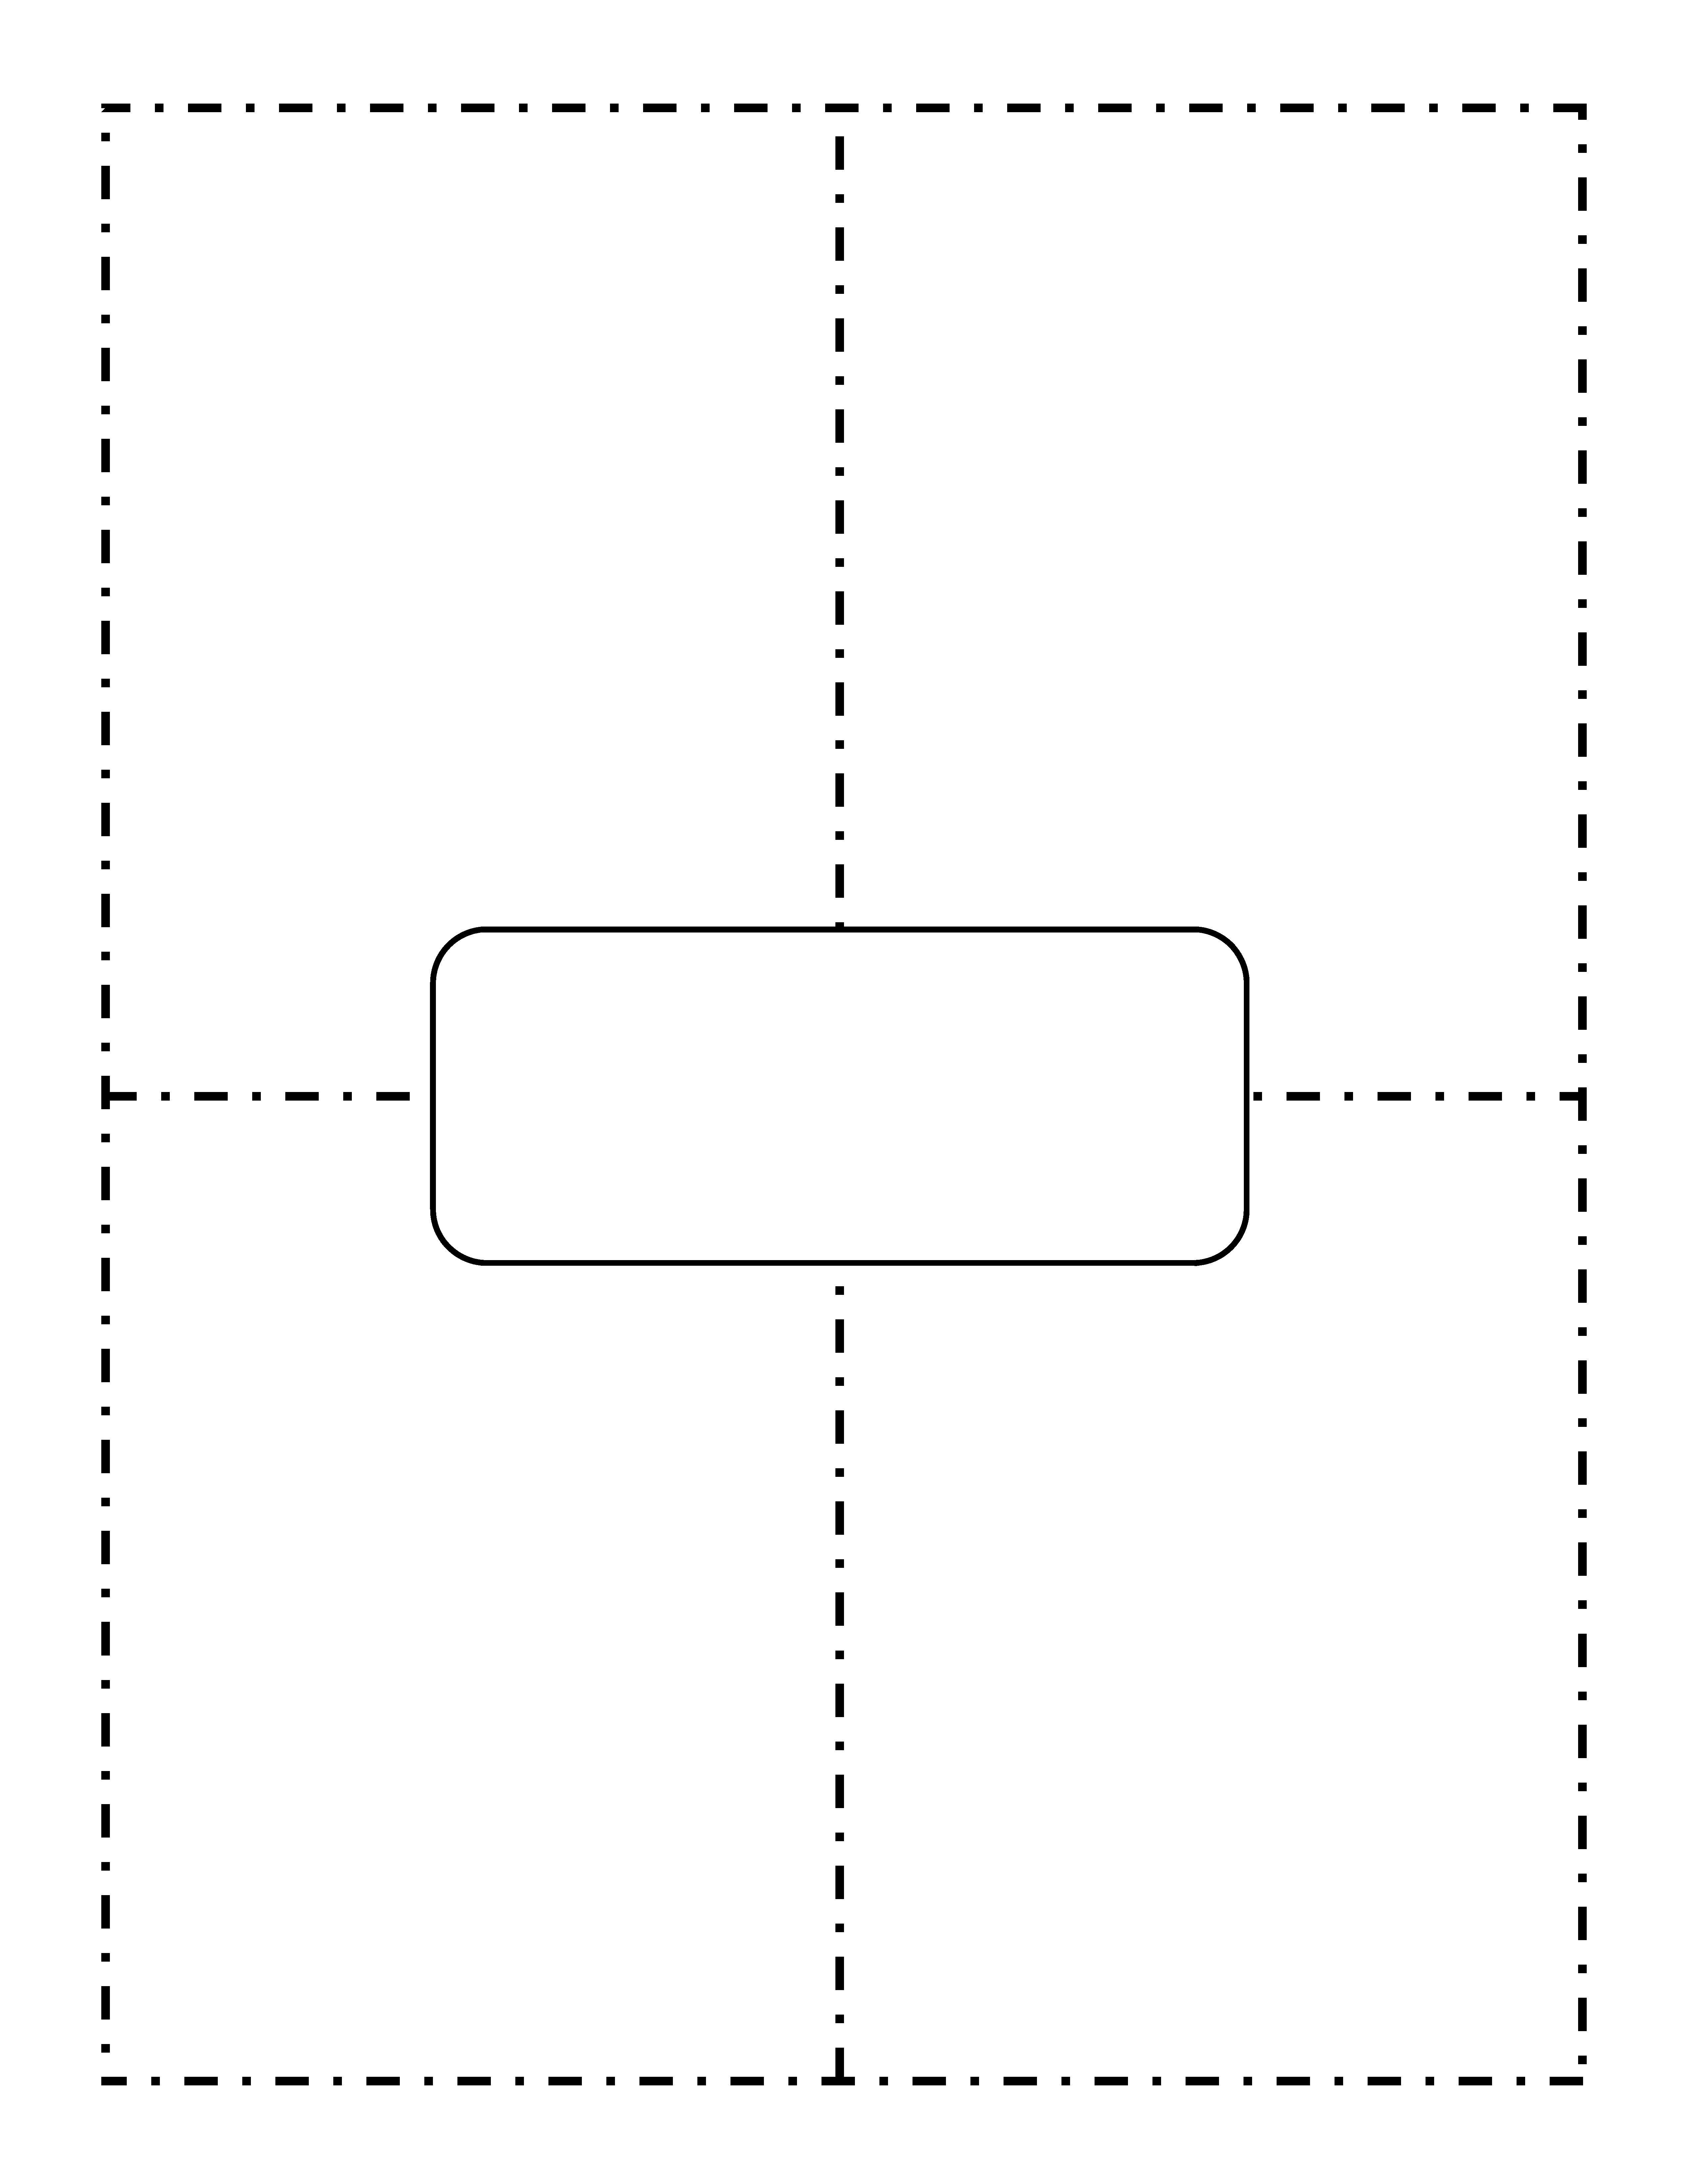 Worksheets Frayer Model Worksheet using 4 block corners template in math